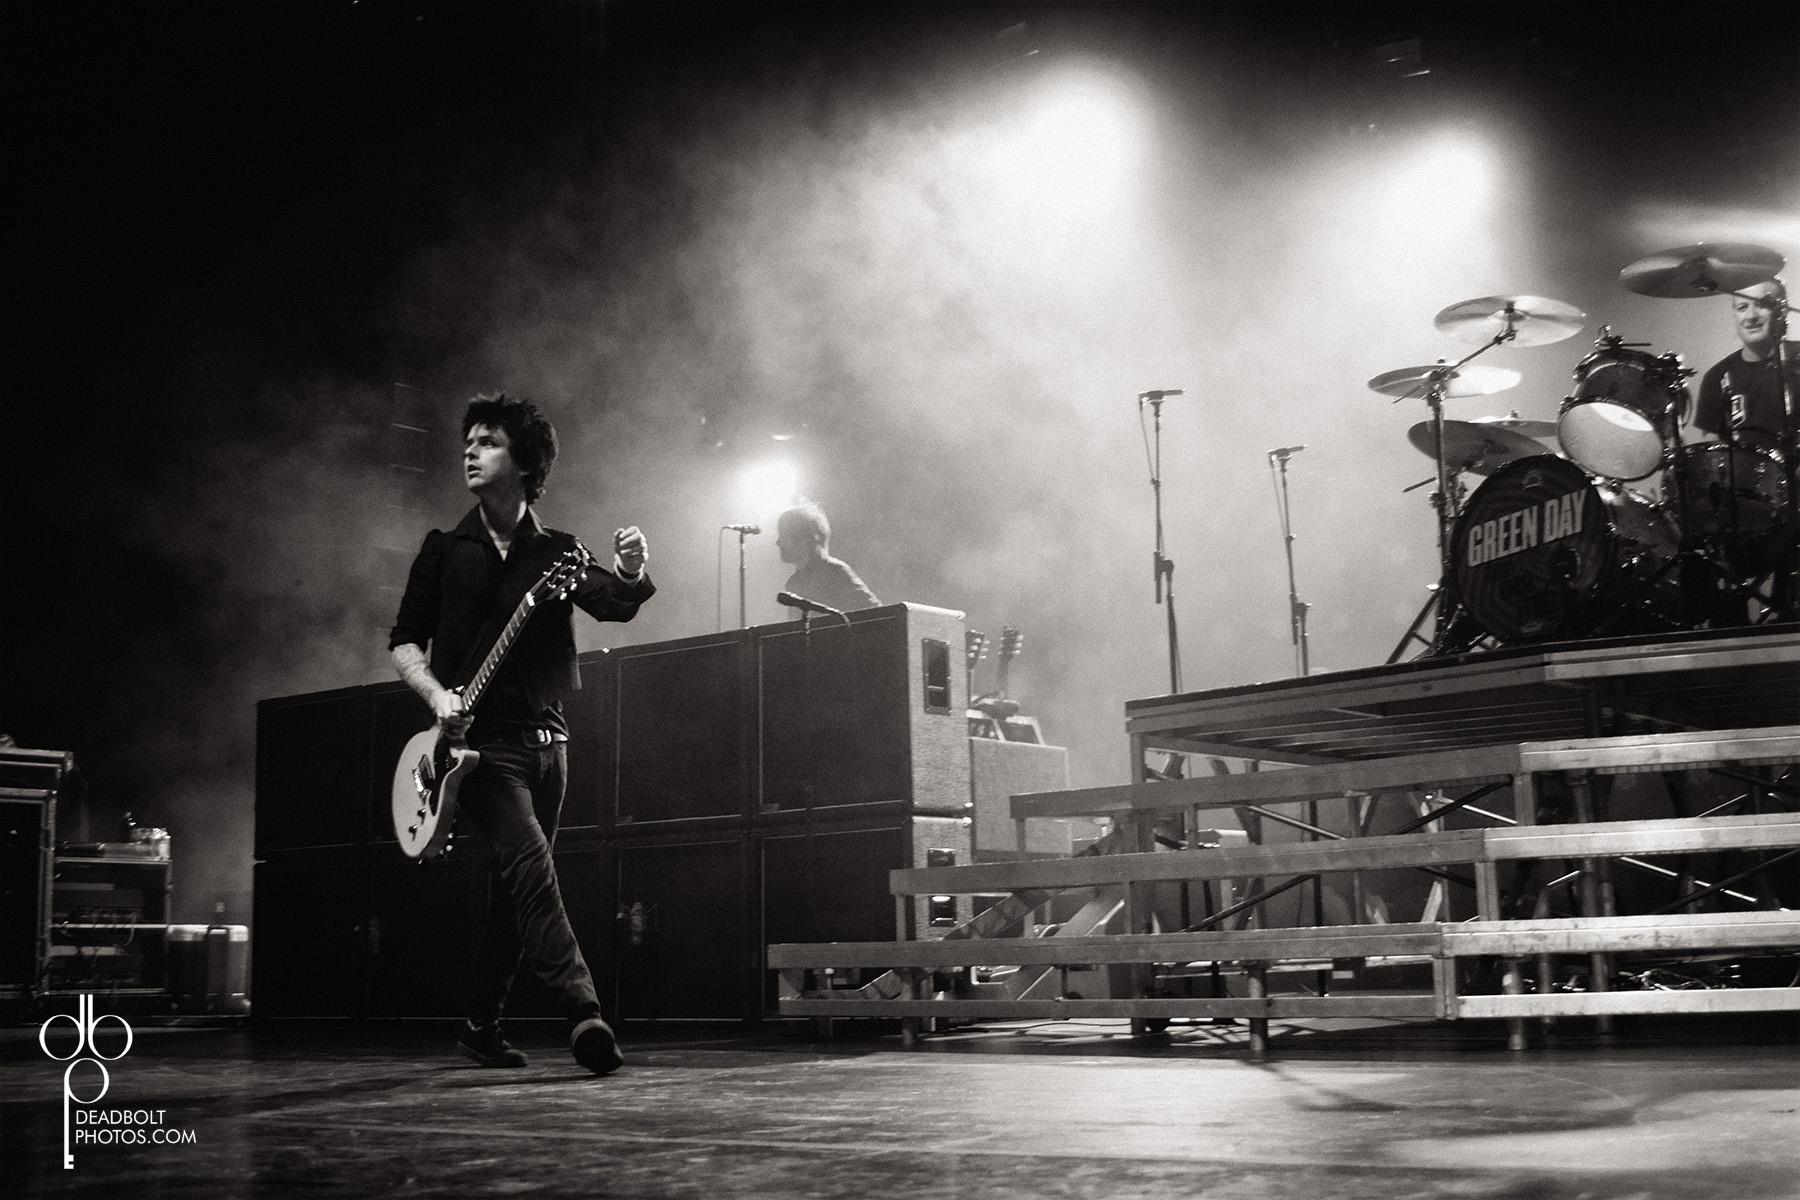 Billie Joe takes the stage